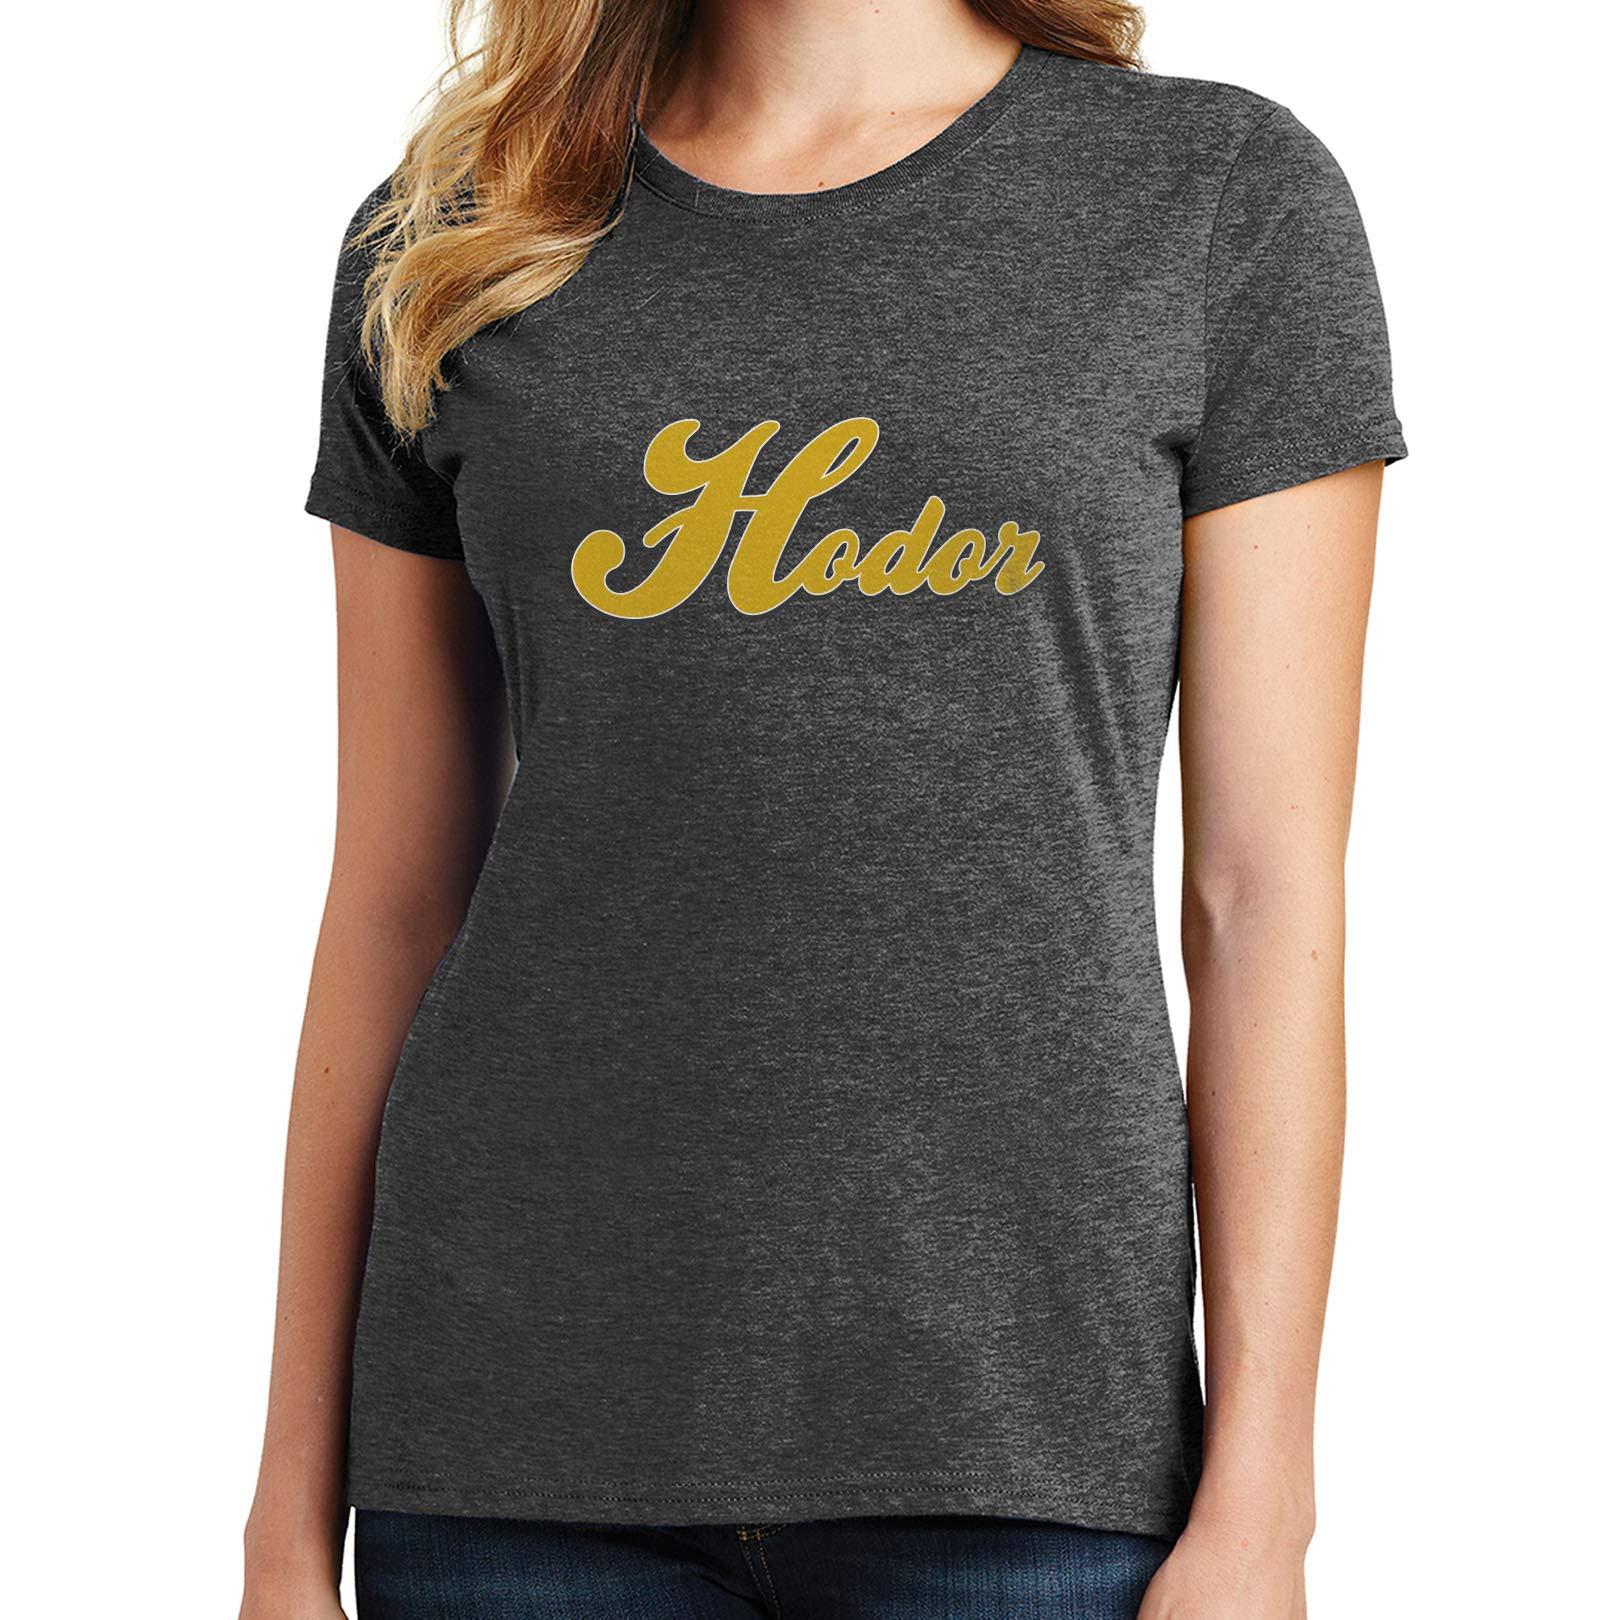 Hodor T Shirt 1225 3752